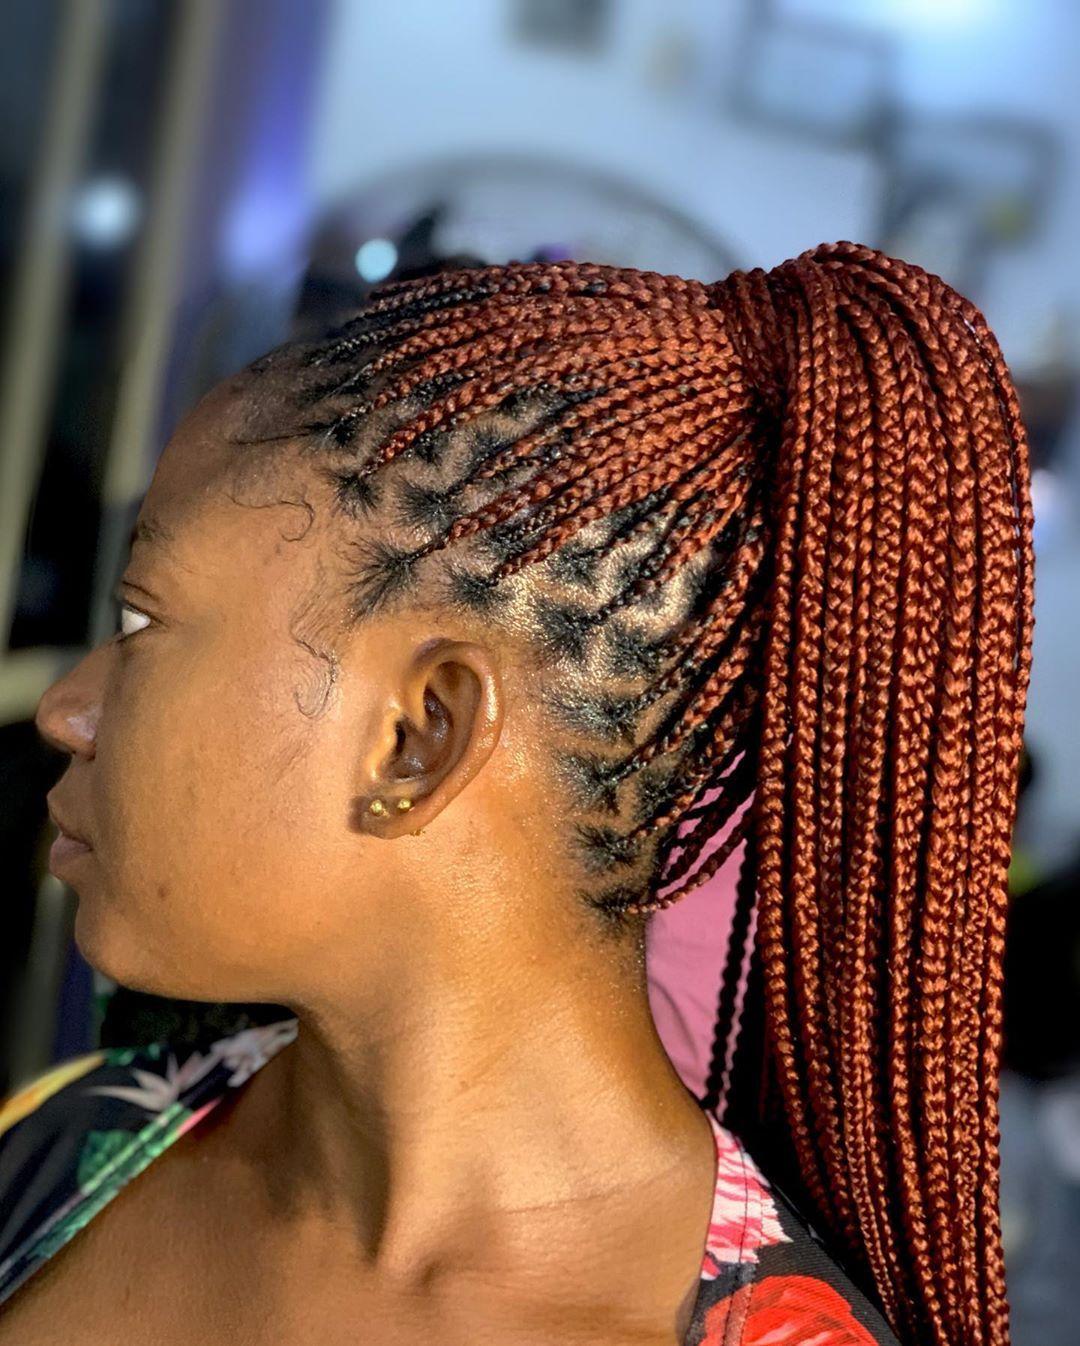 Giwa Oluwafunke On Instagram Knotless Braids In 350 Hair Installed For Faymous Feed In Braids Hairstyles Braided Hairstyles Braided Hairstyles For Teens